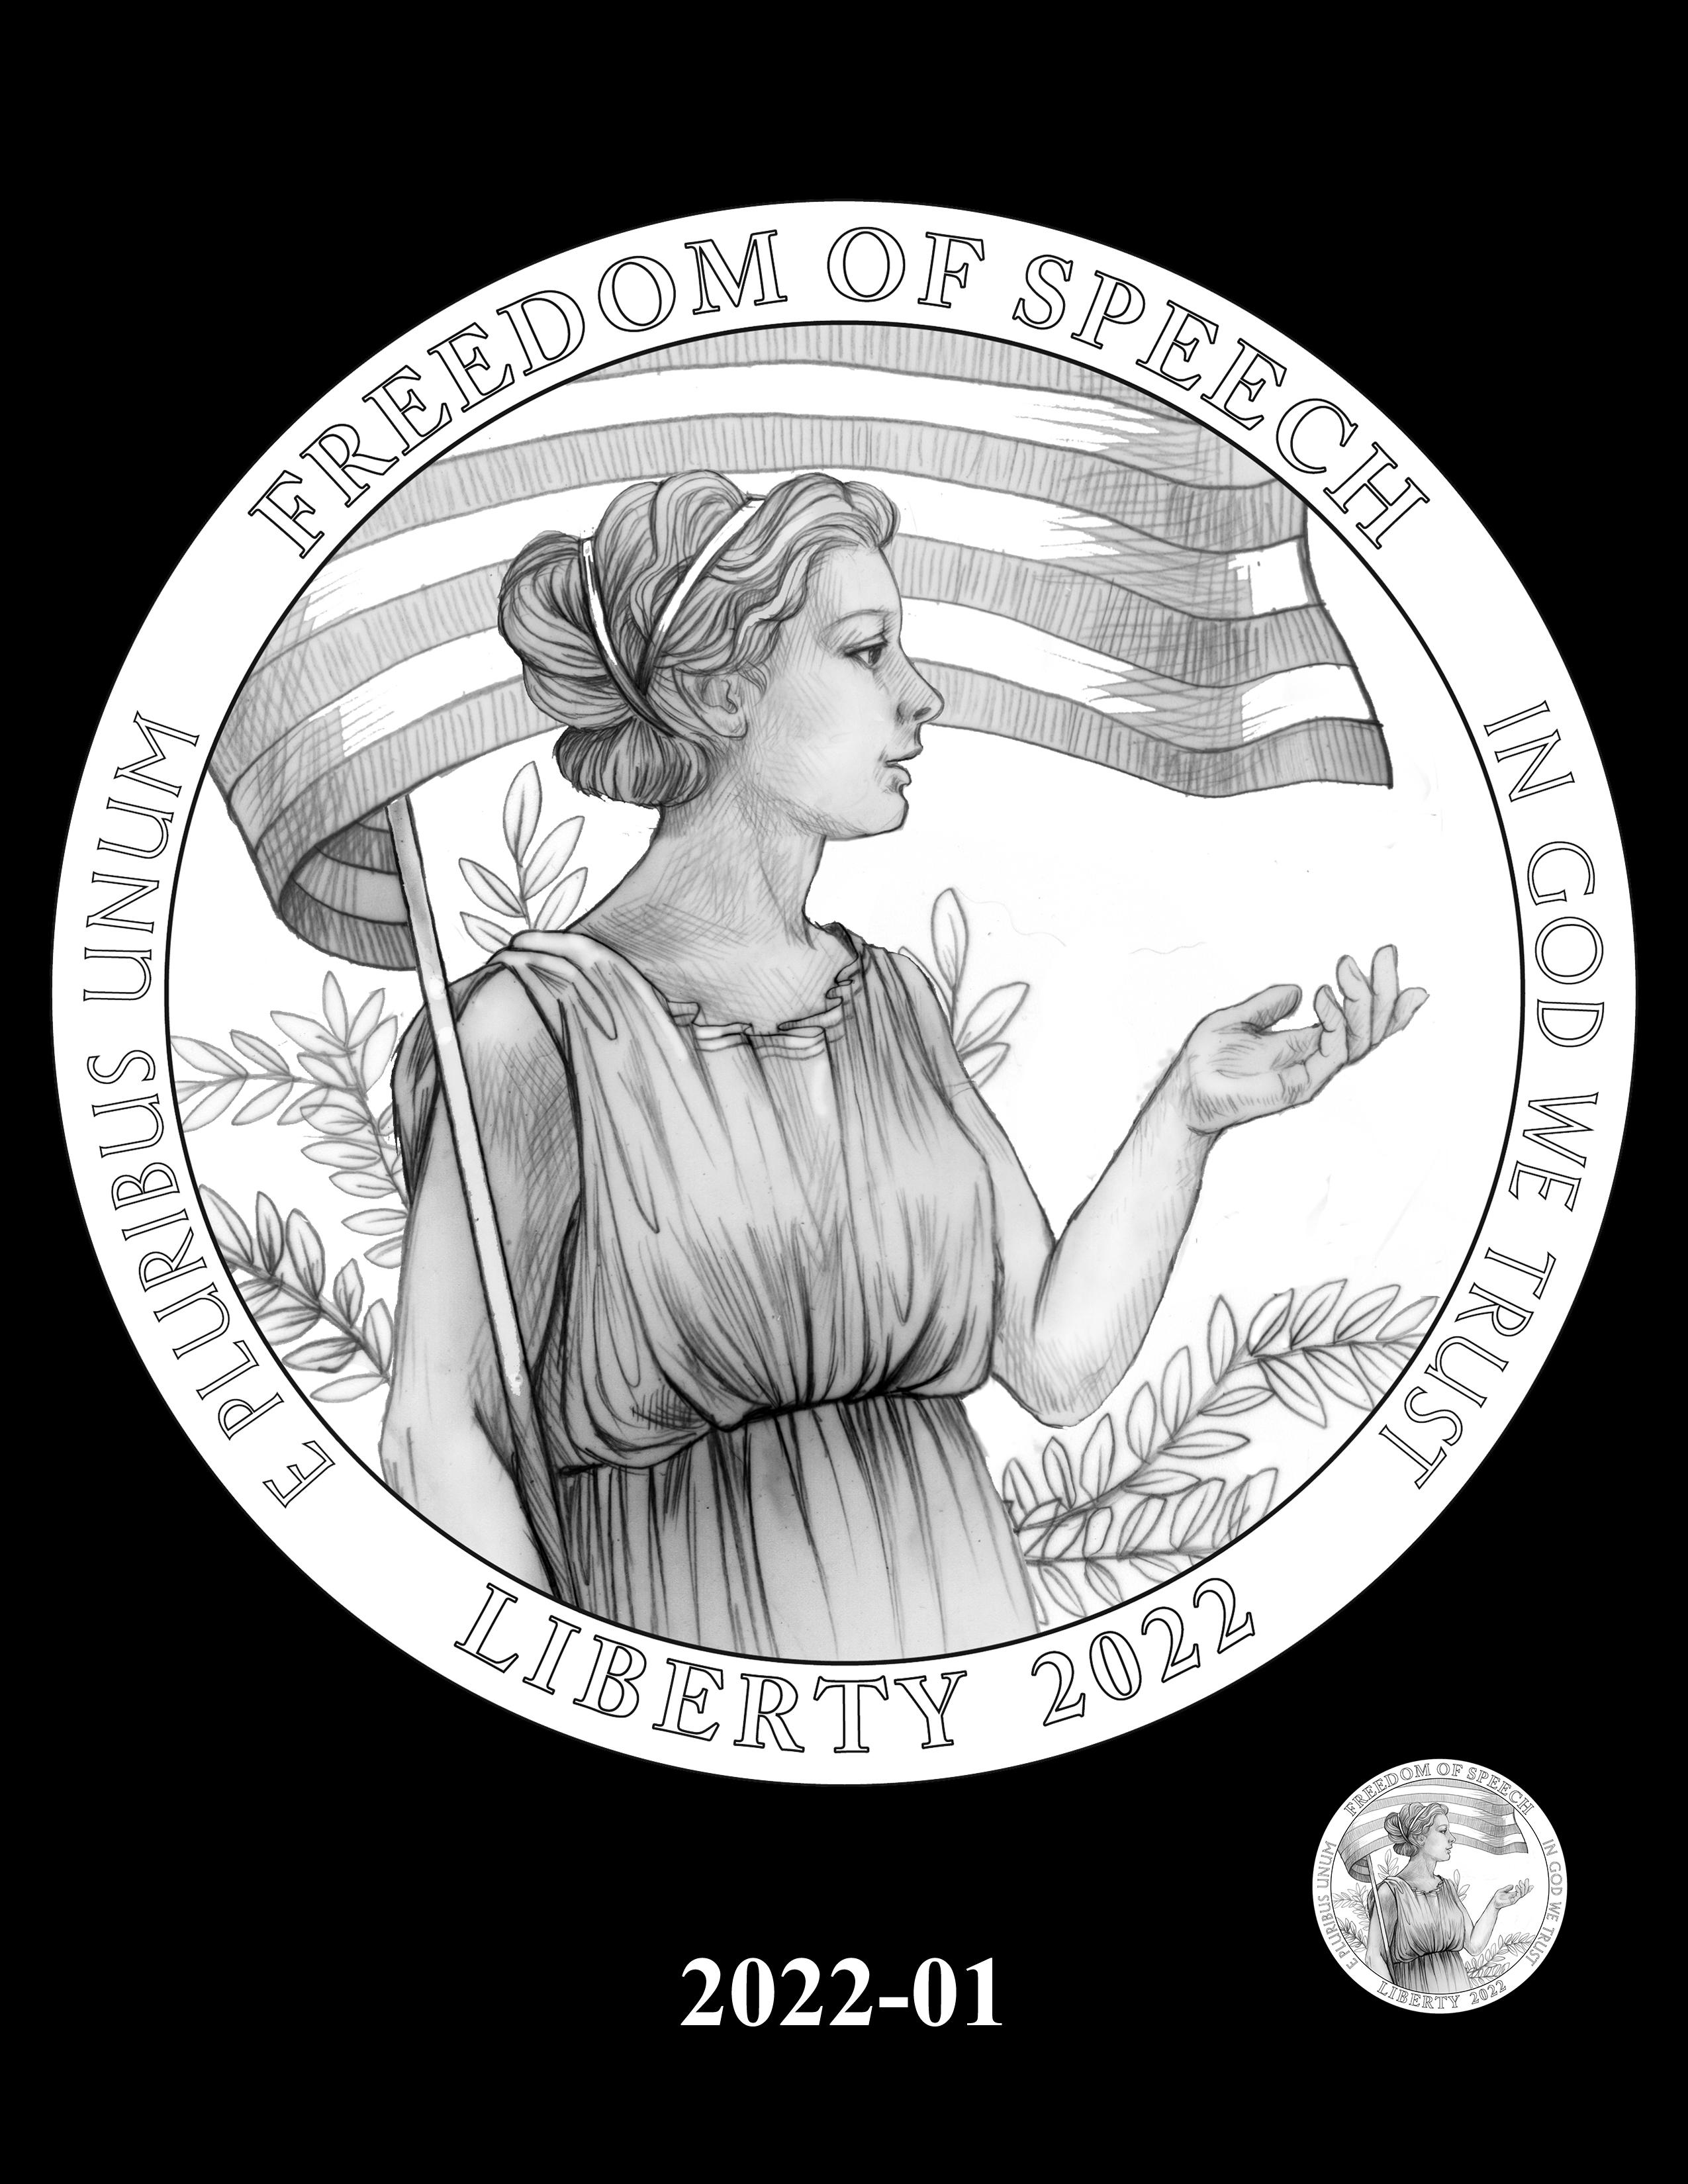 01-2022 -- 2021 - 2025 American Eagle Platinum Proof Program